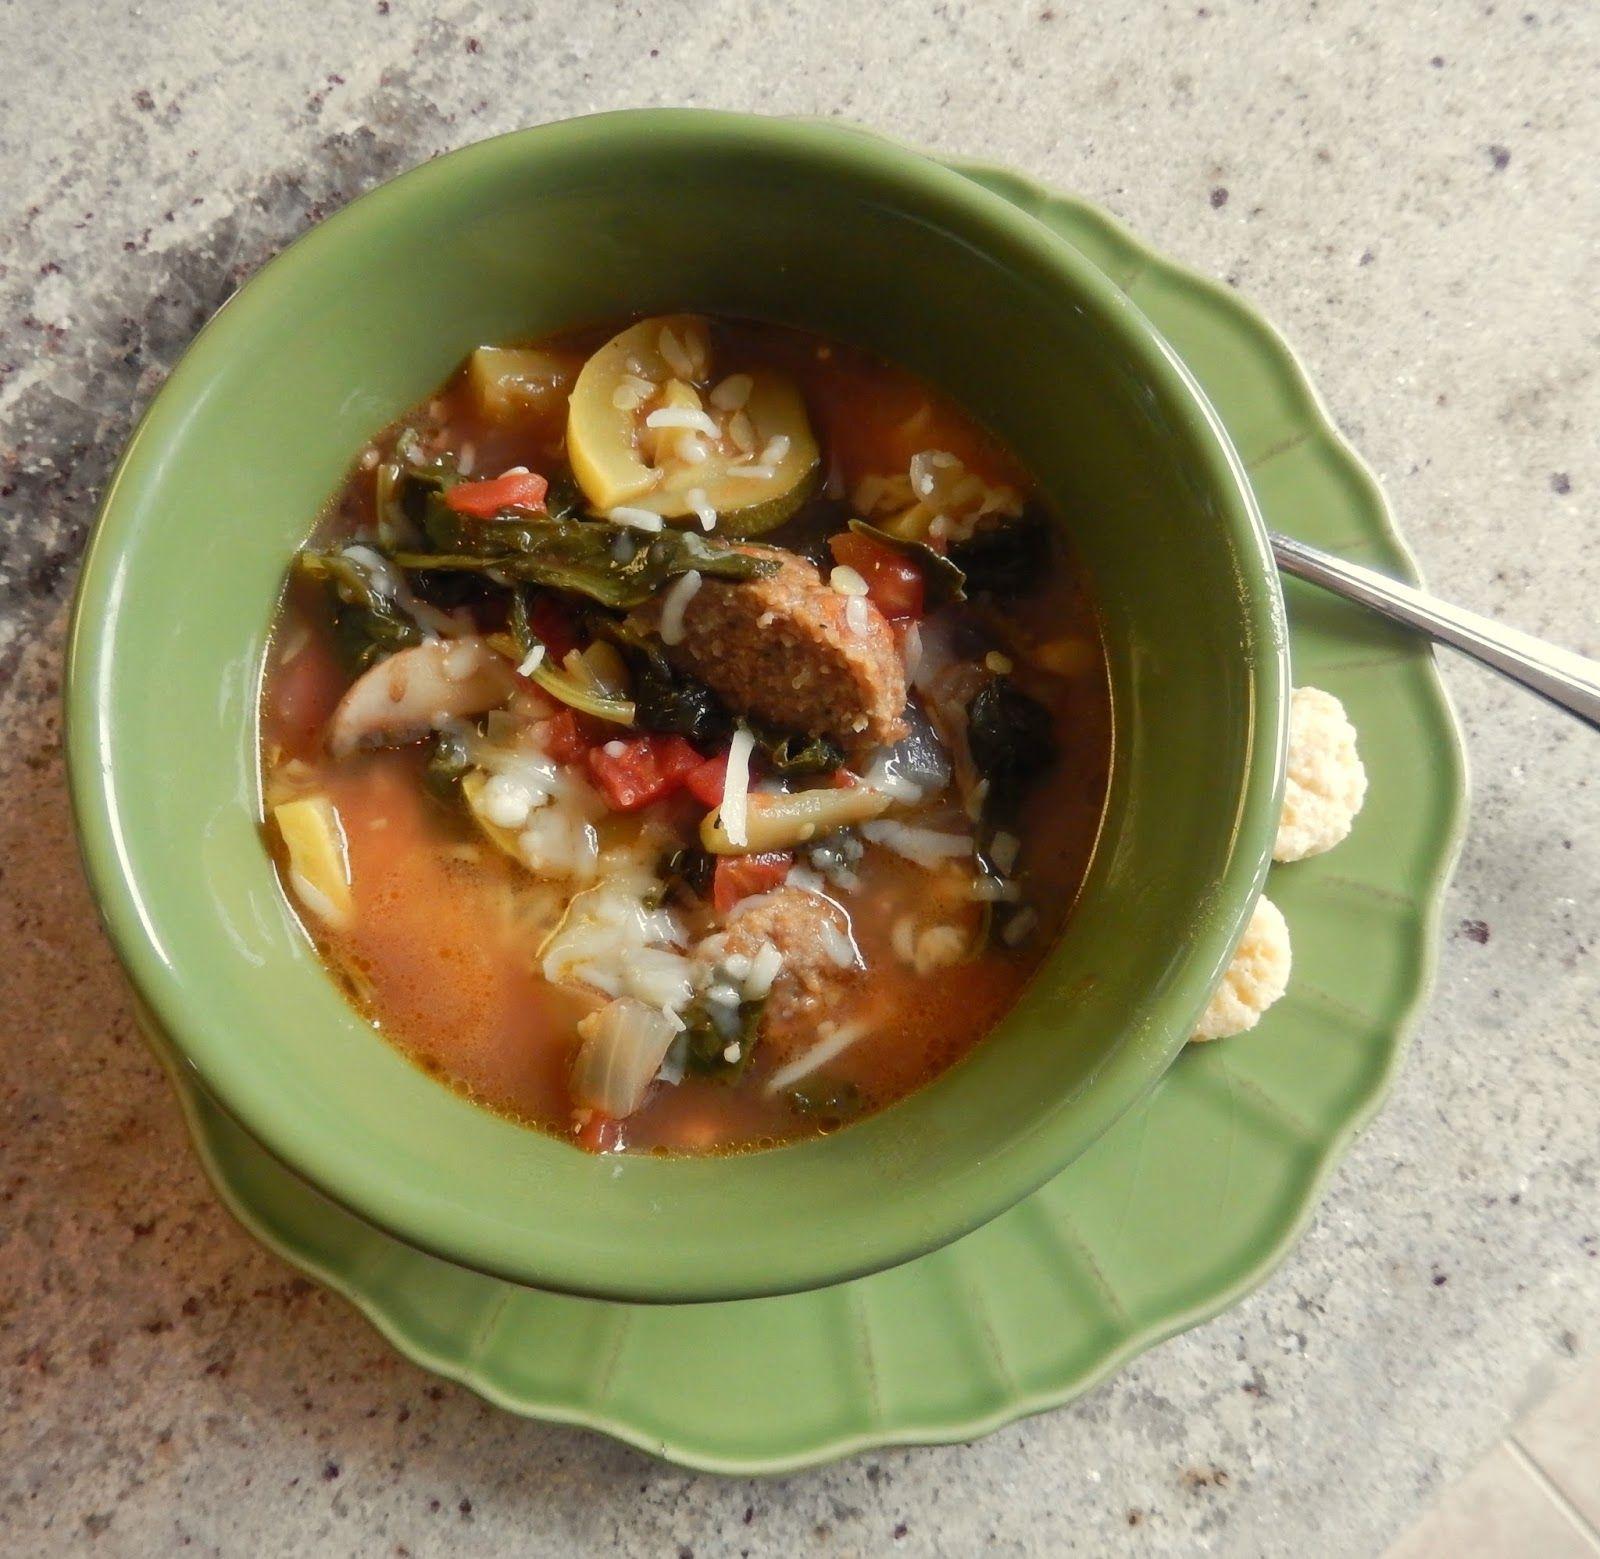 Healthy Soup Recipes: Rainy Day Meatball Garden Soup | Warm feeling ...